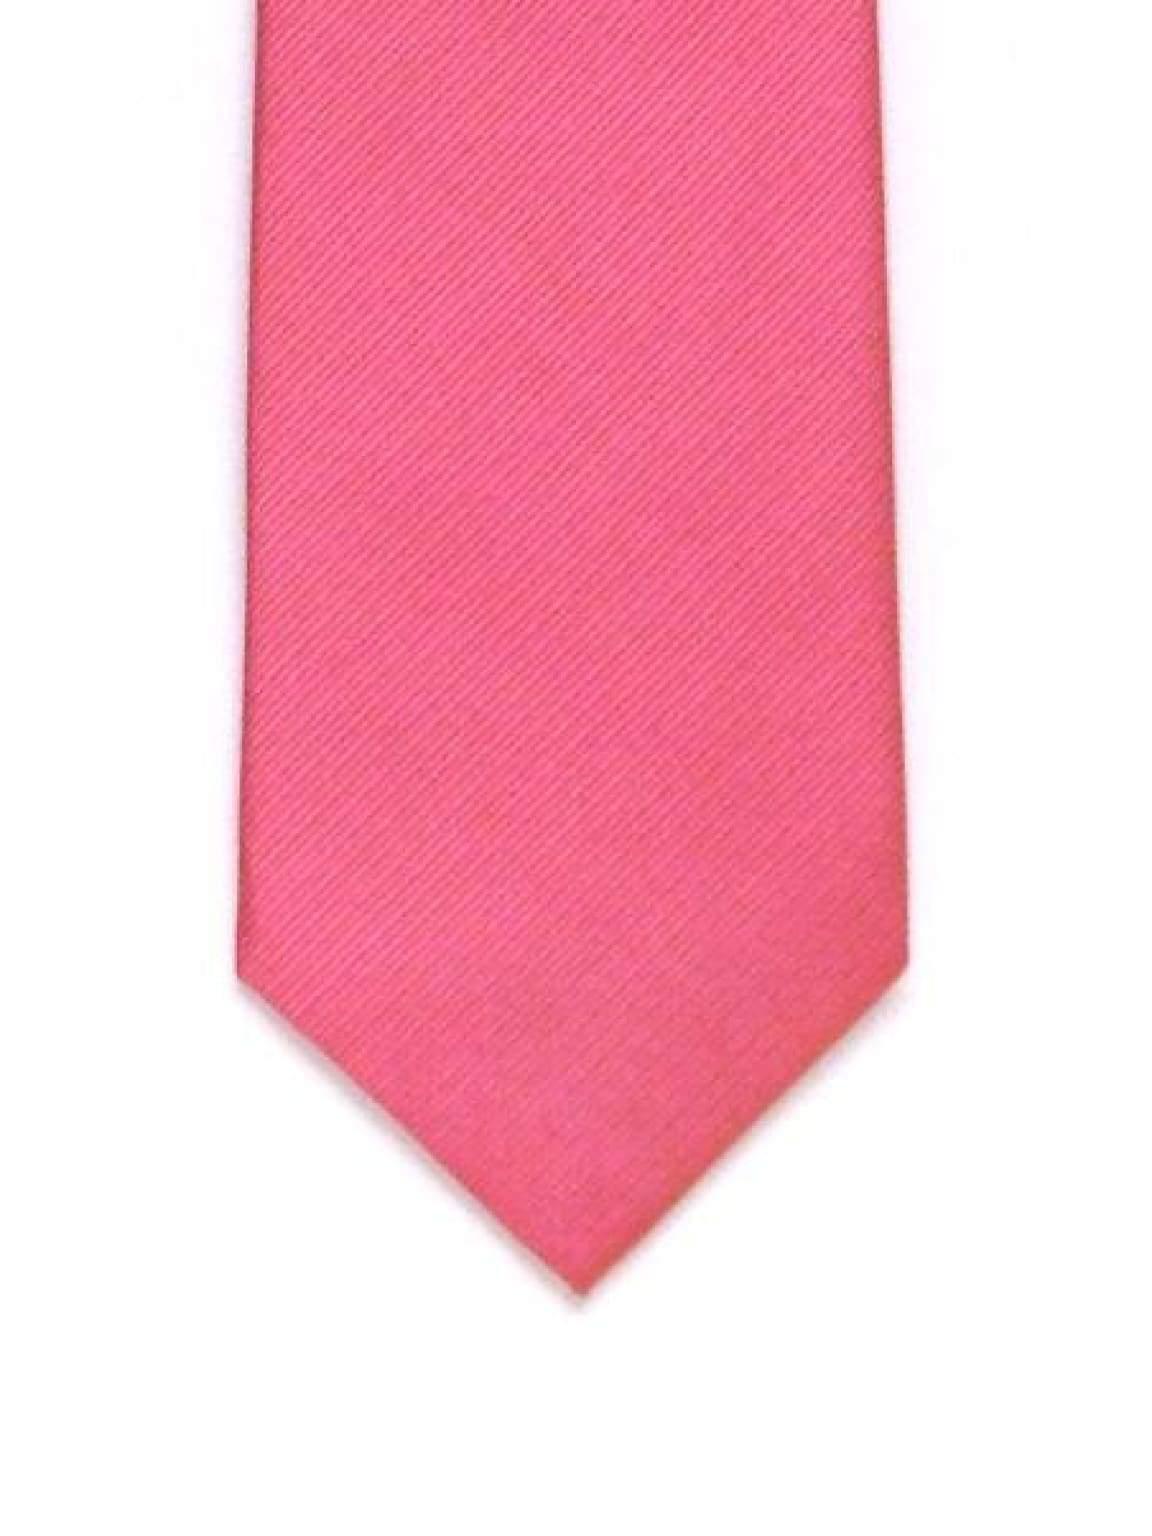 LA Smith Plain Hot Pink Silk Tie - Accessories